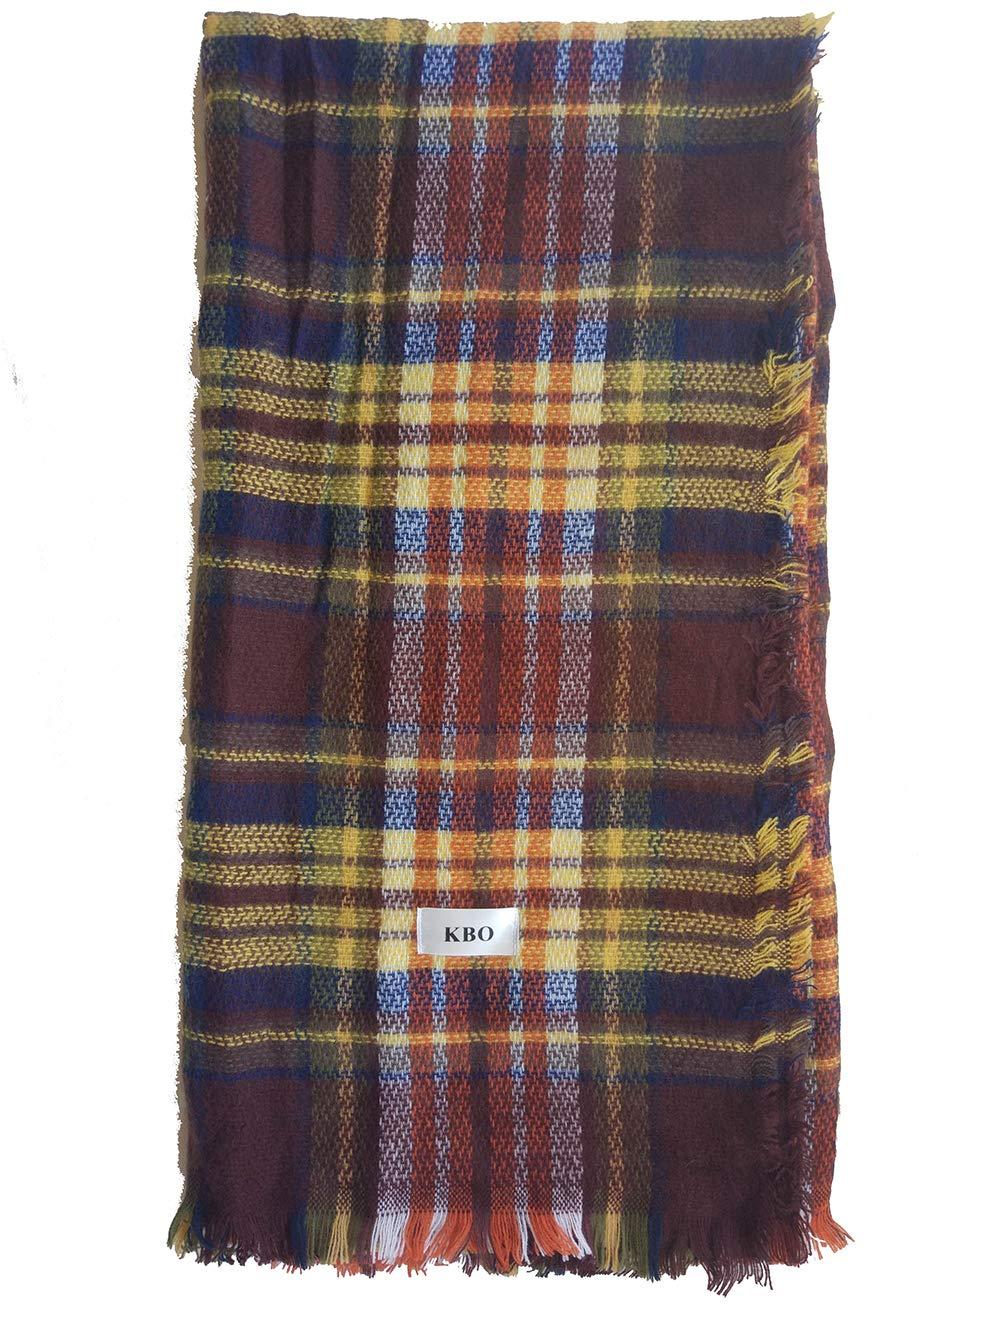 KBO Woman's Eternal Style Scarf, Classic Elegant Carpet Lattice Scarf by K&Bo (Image #3)